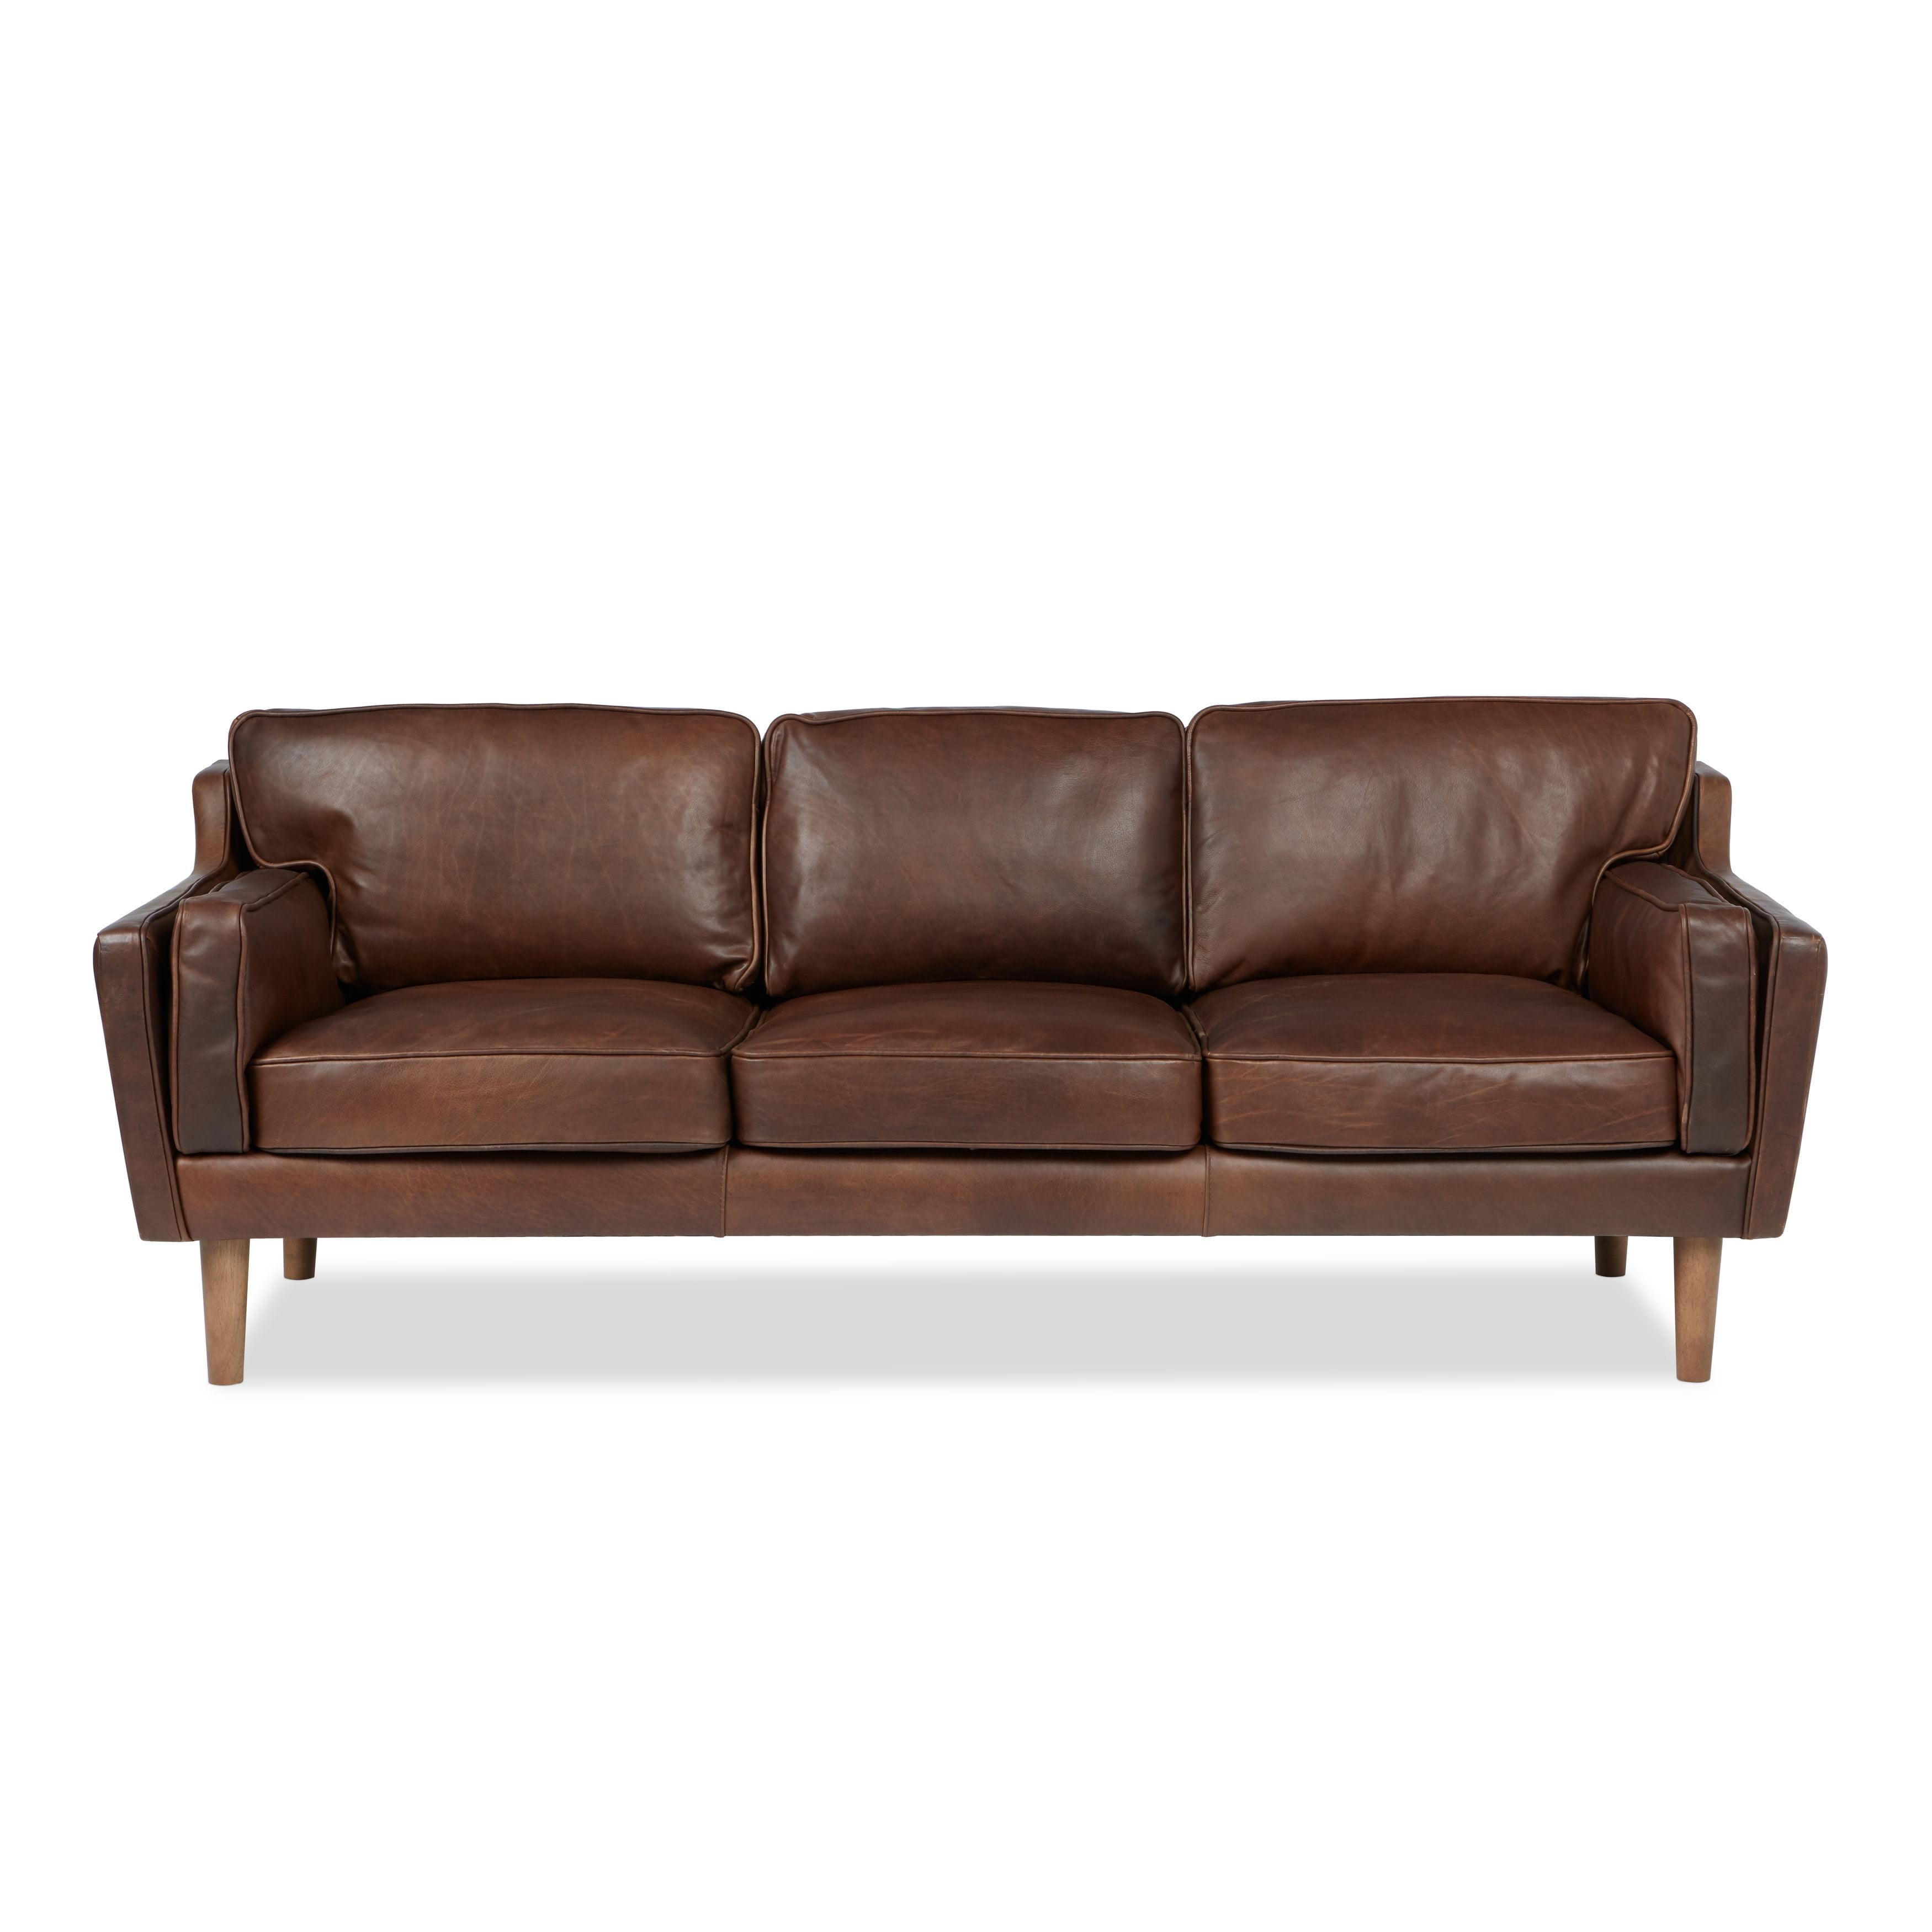 Jasper Laine Studio Beatnik Leather Sofa Columbus Chocolate